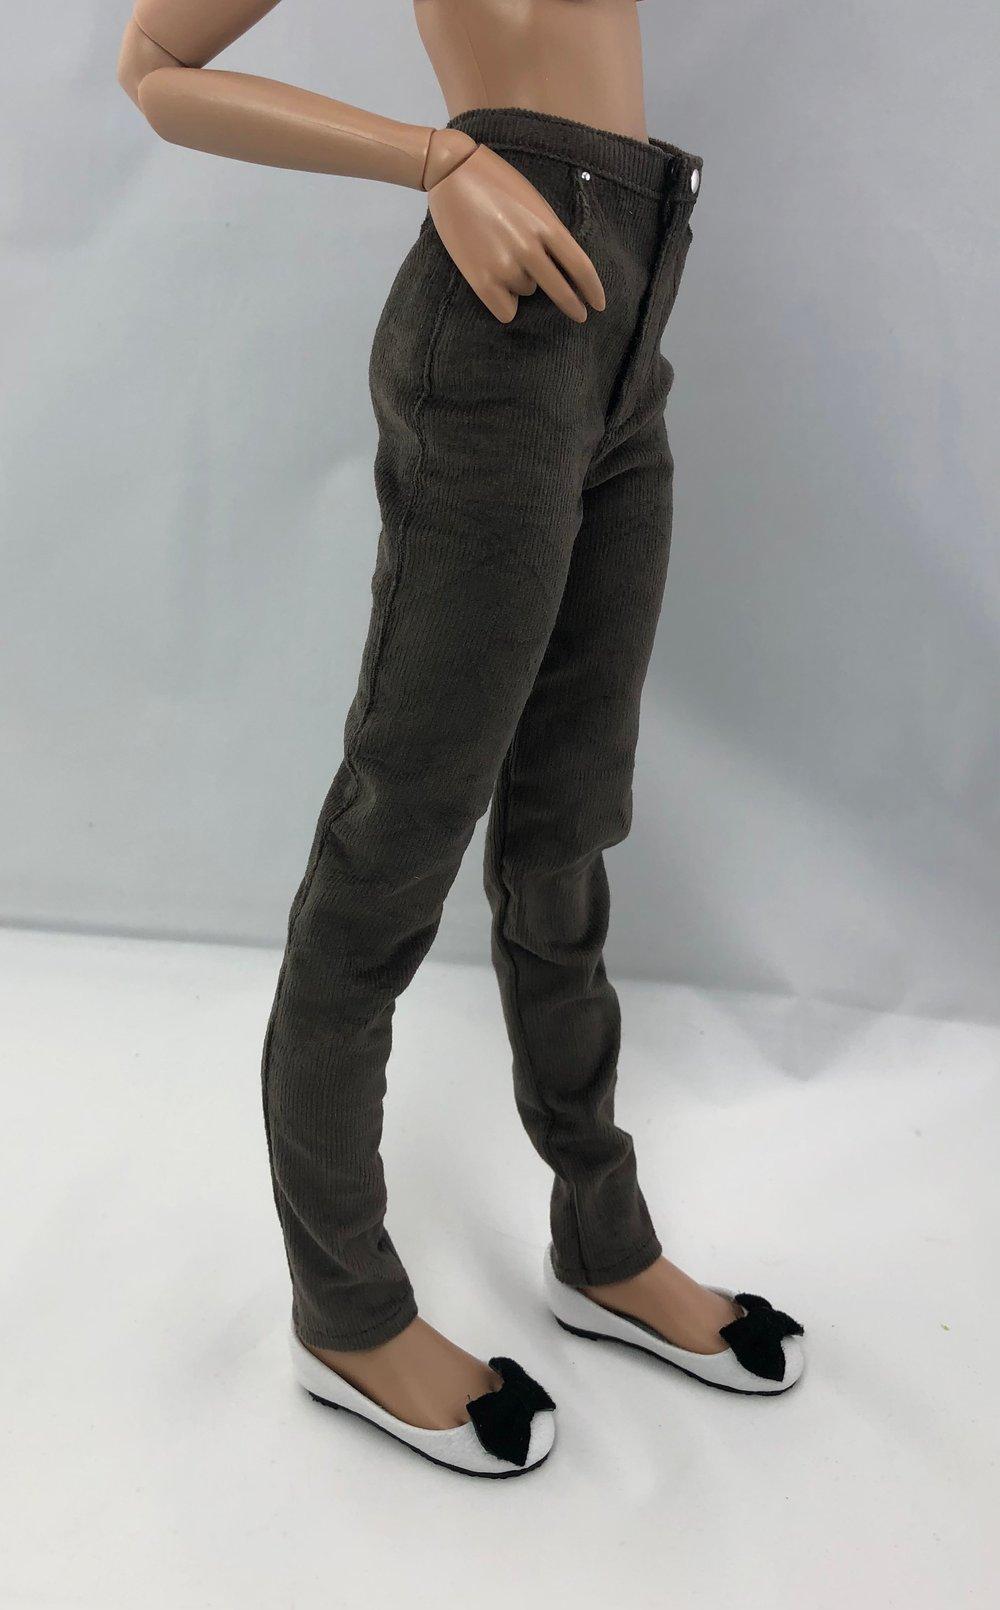 Gray Corduroy Pants: Minifee